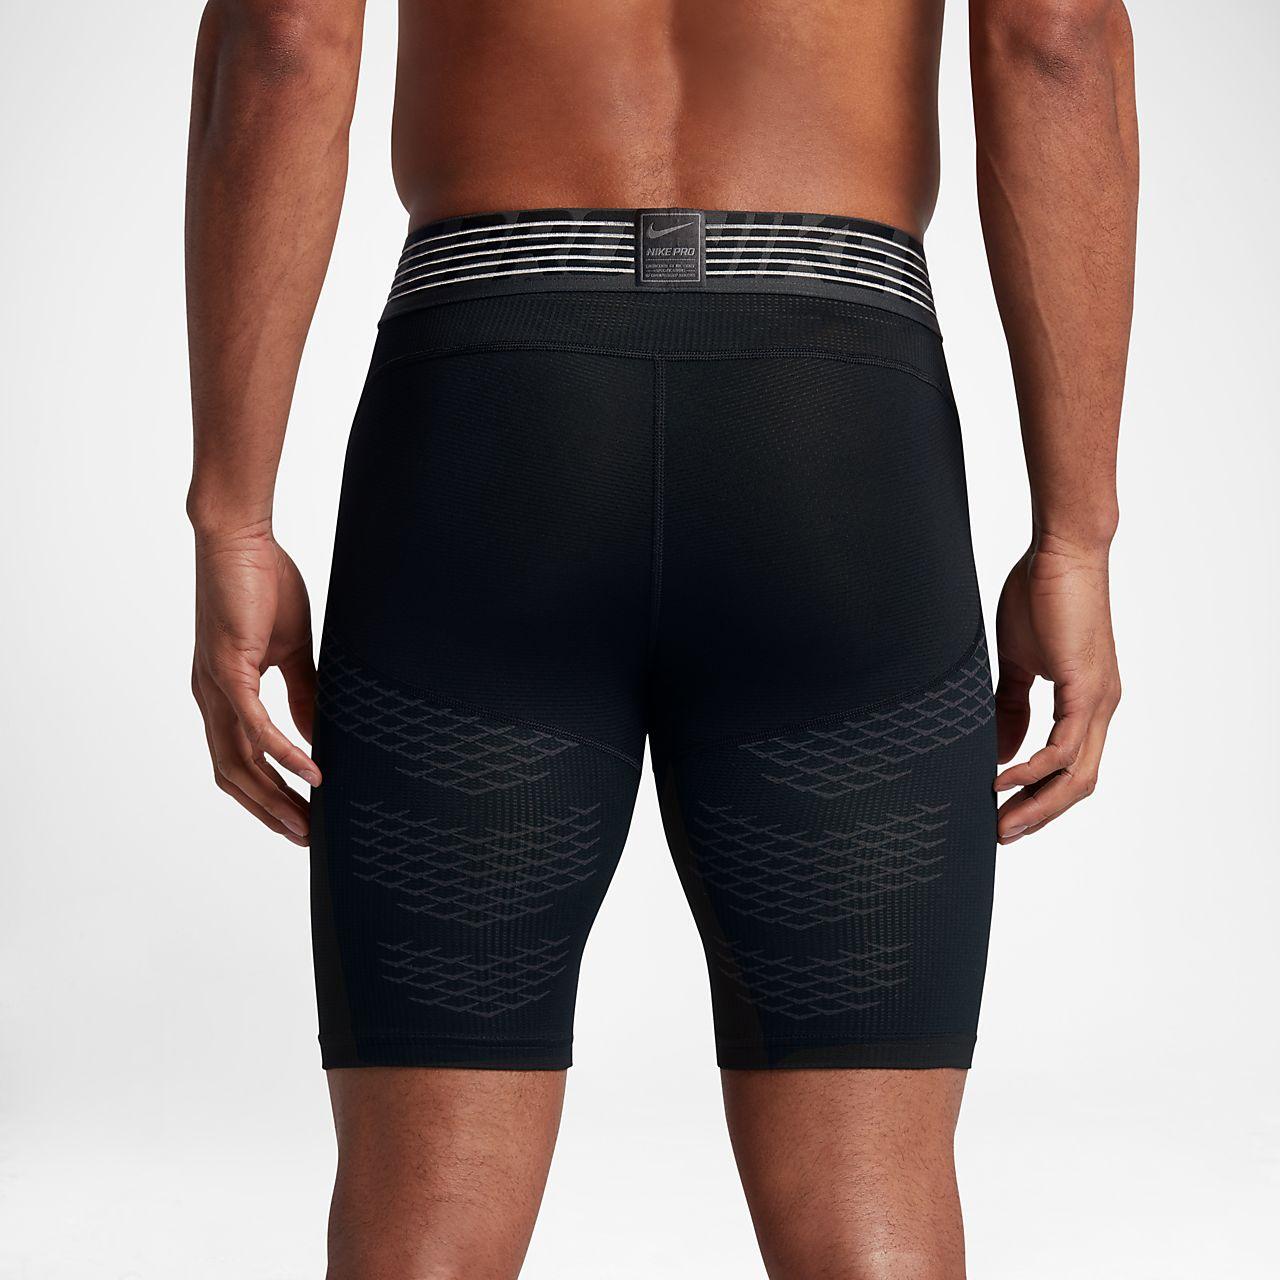 Nike Blazer Hommes Bas Shorts Hauteur